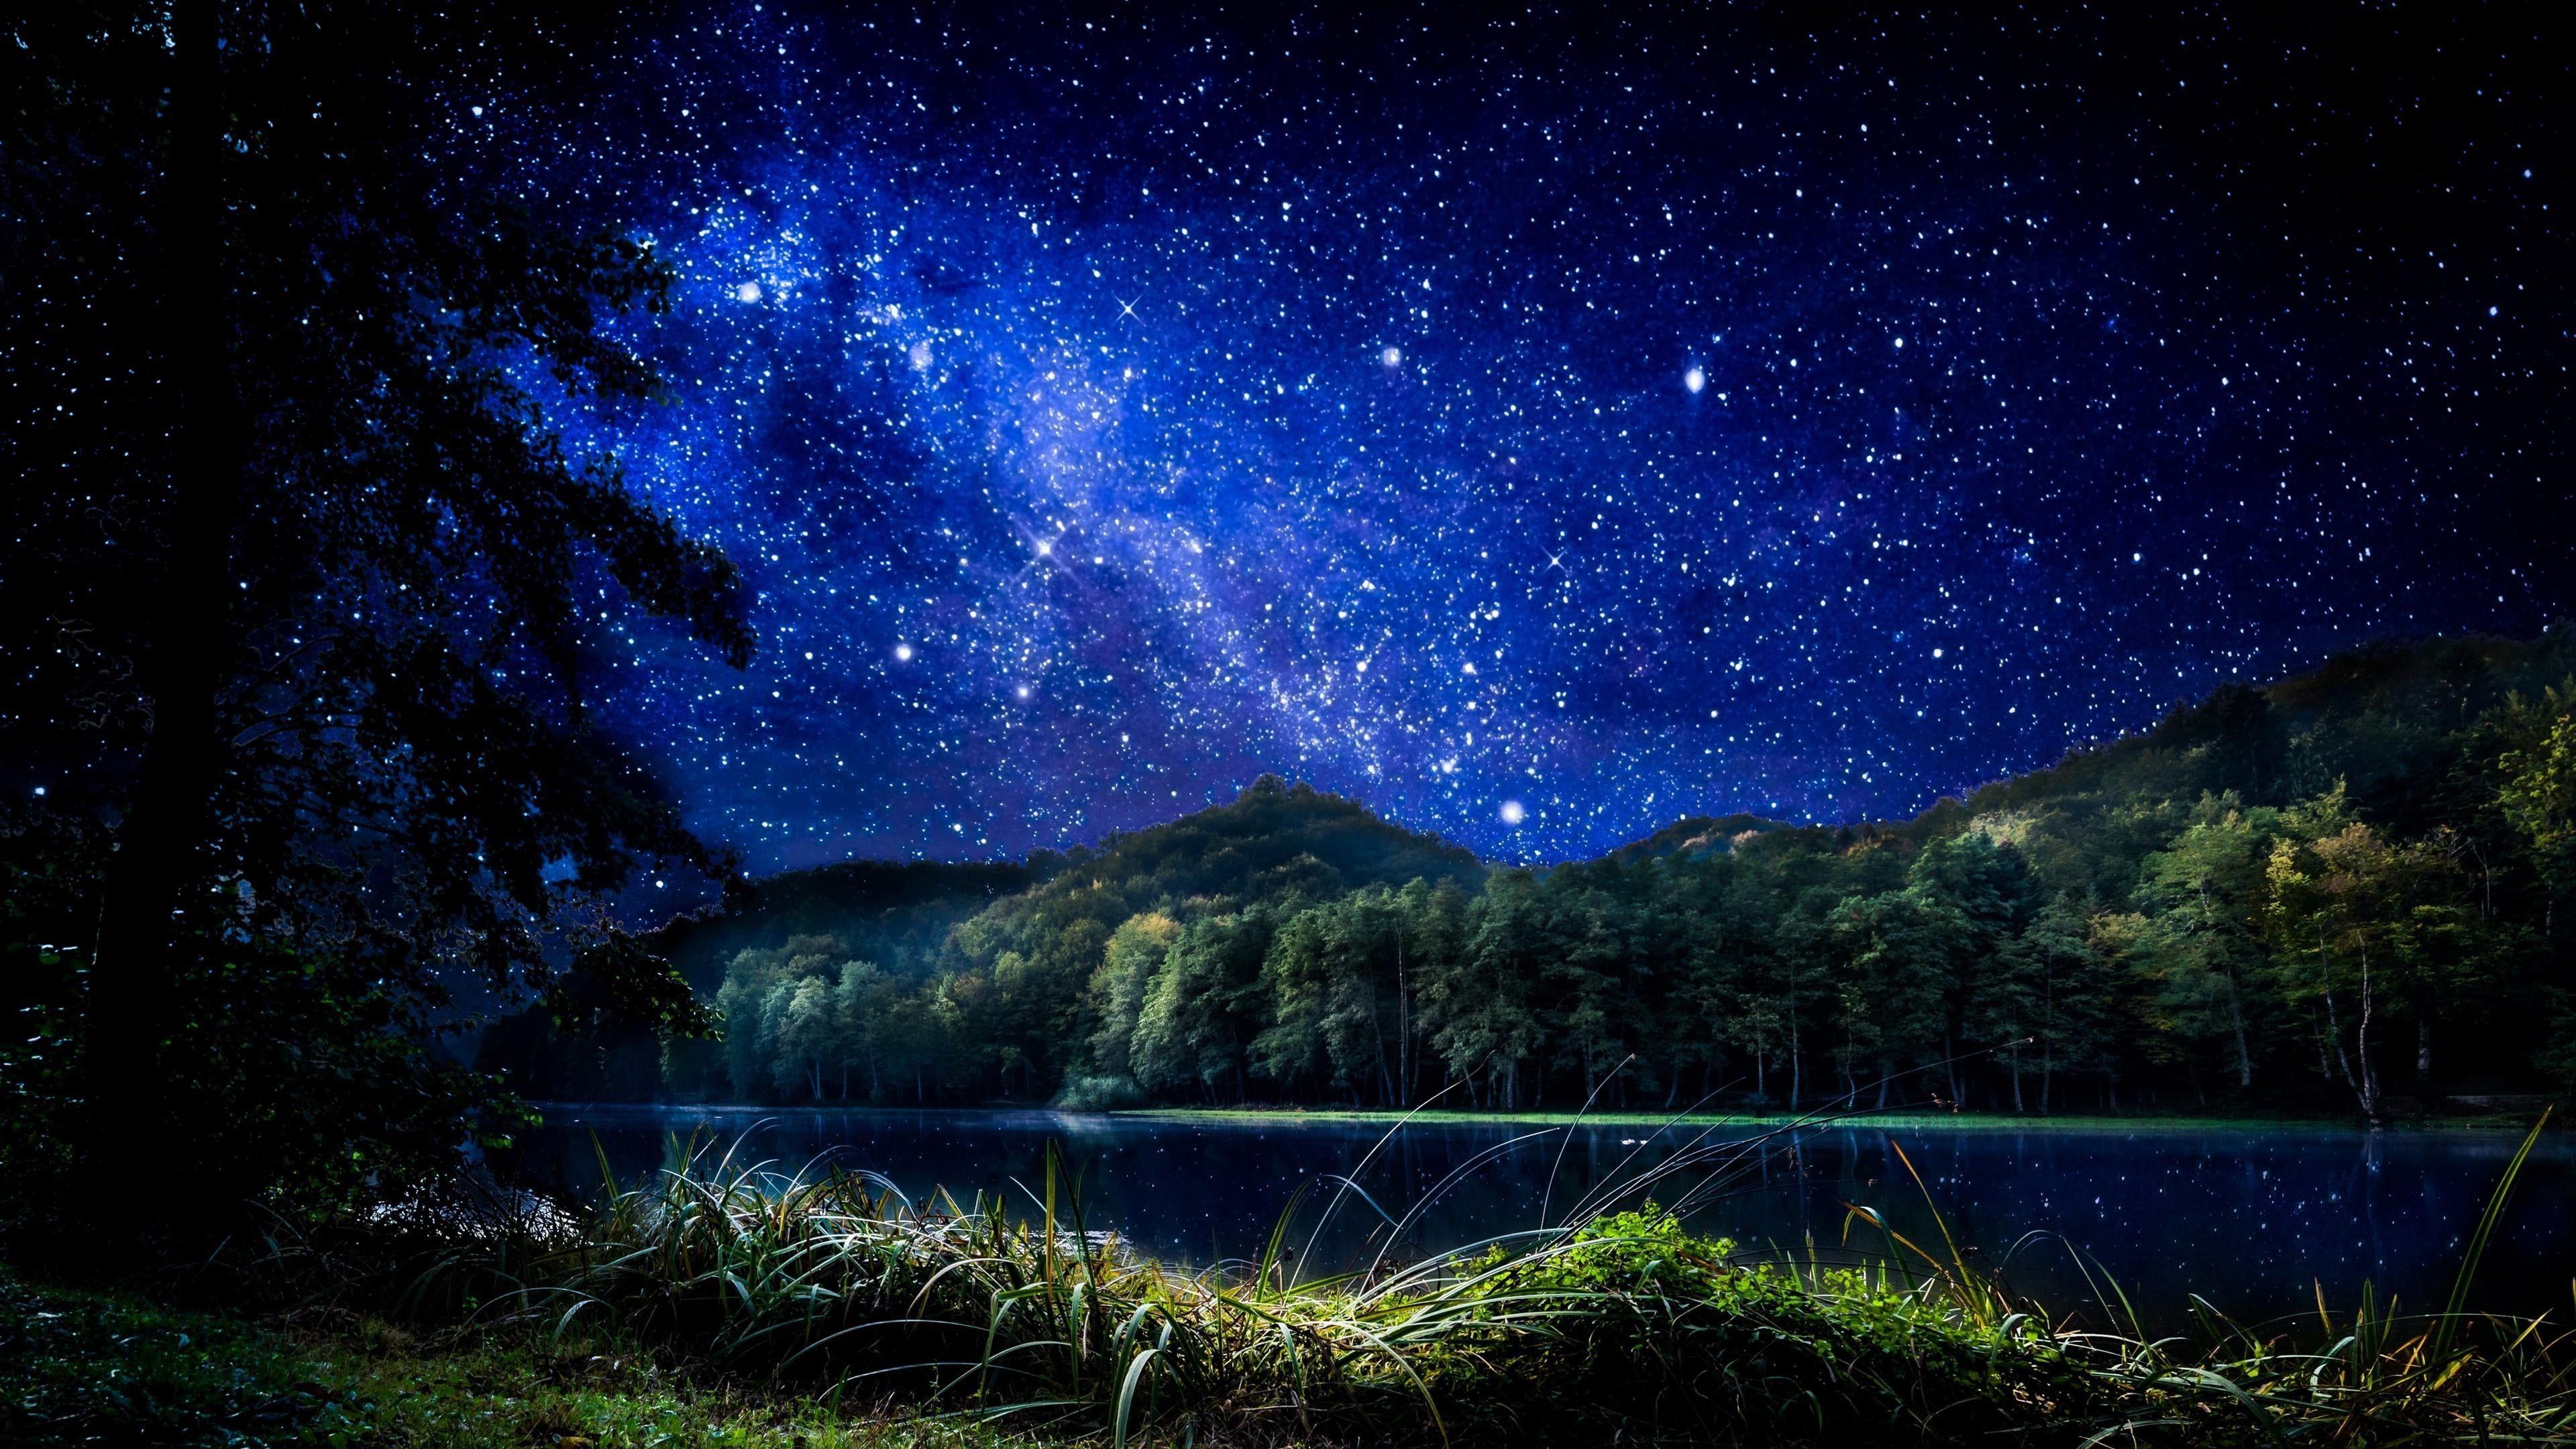 Sky Night Milky Way Starry Night Sky Lake Lakeside Mountains 4k Wallpaper Hdwallpaper Desktop Starry Night Sky Sky Lake Beautiful Night Sky